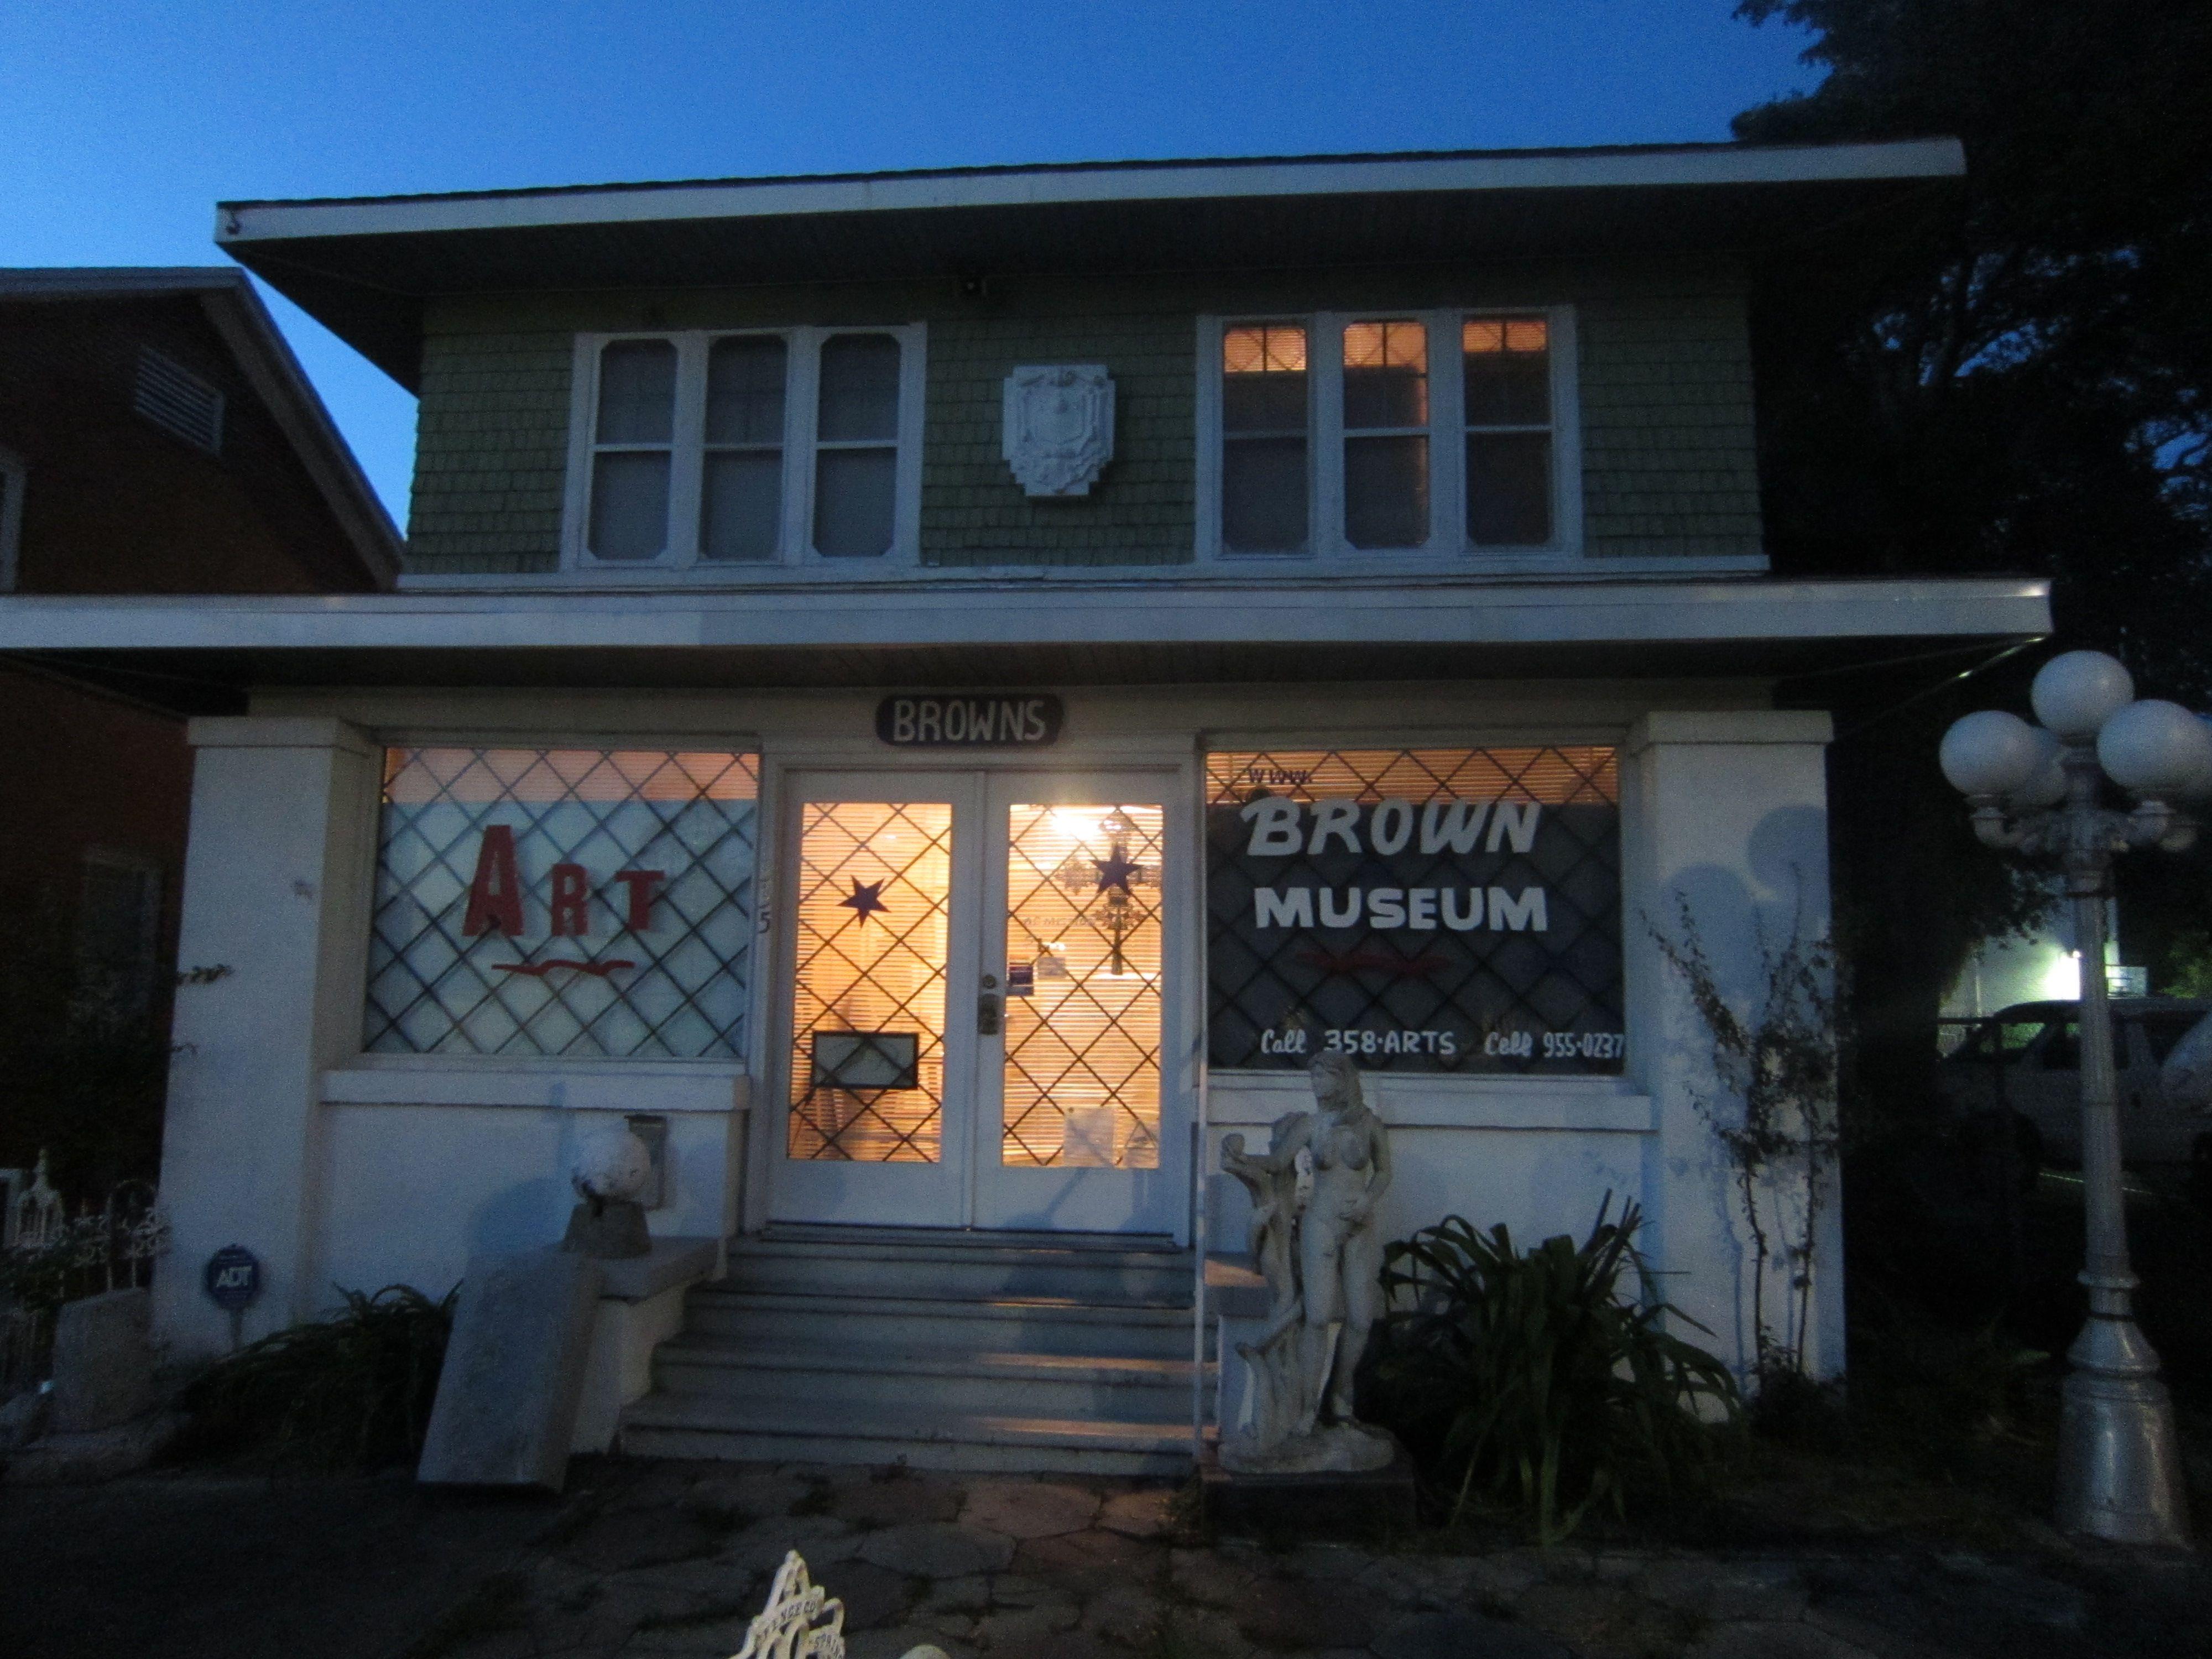 Springfield Brown Museum of Art